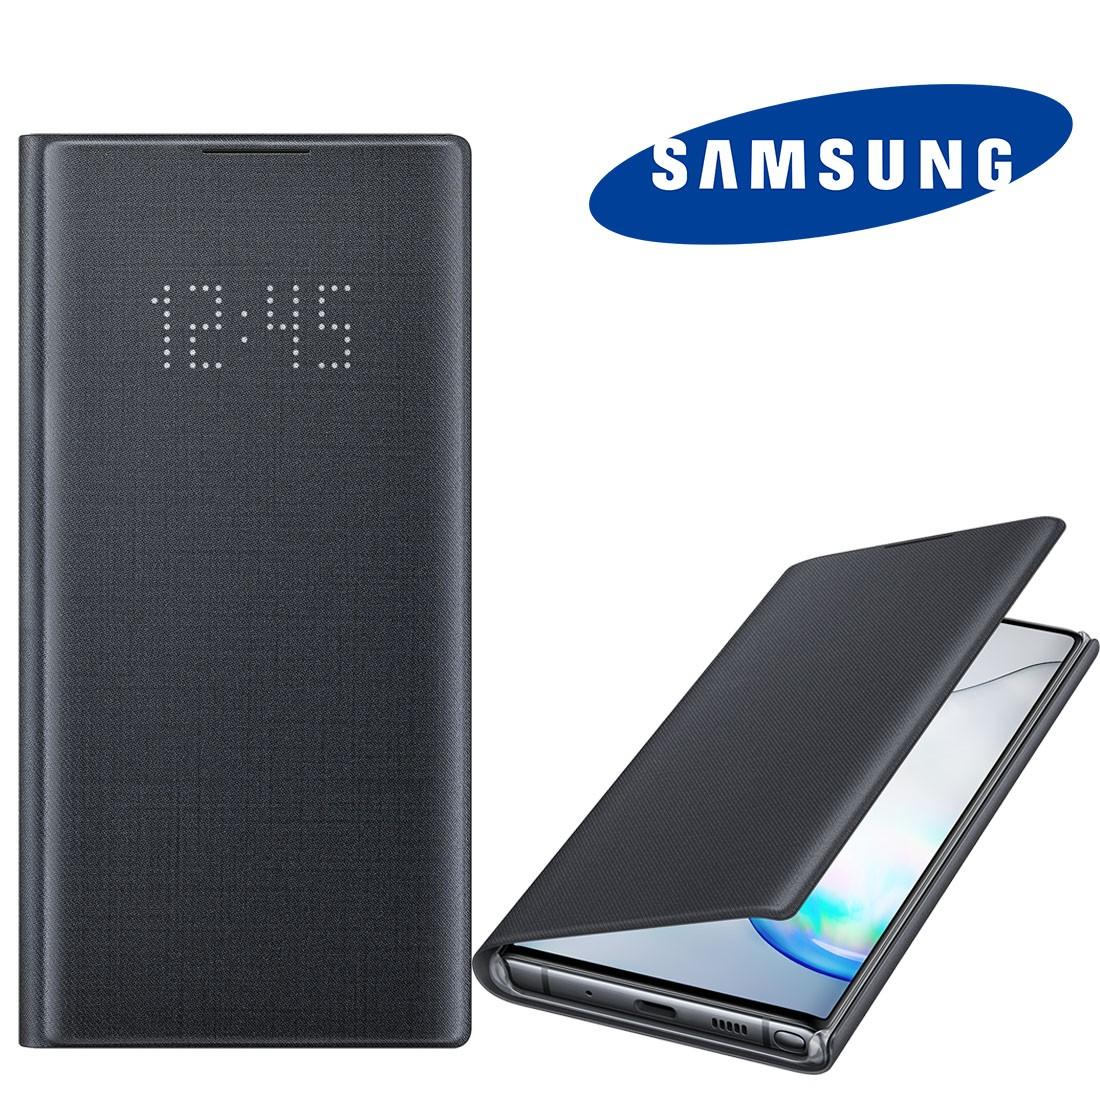 Capa Original Samsung Led View Cover Galaxy Note 10 6.3 pol SM-N970